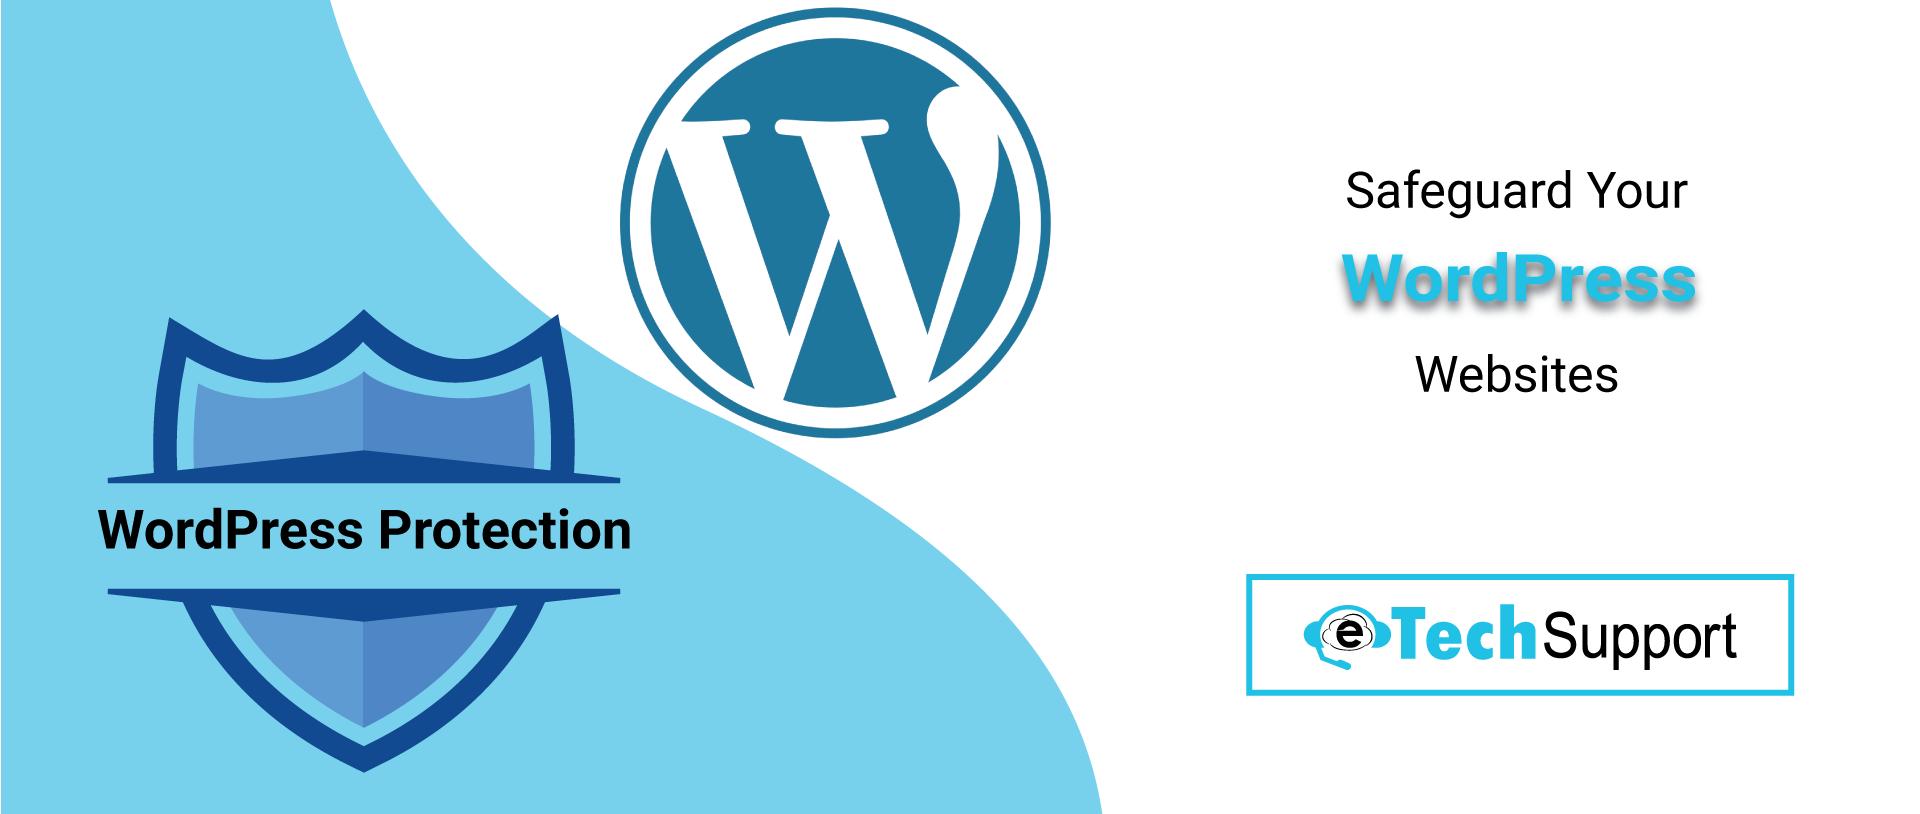 safeguard-your-WordPress-websites